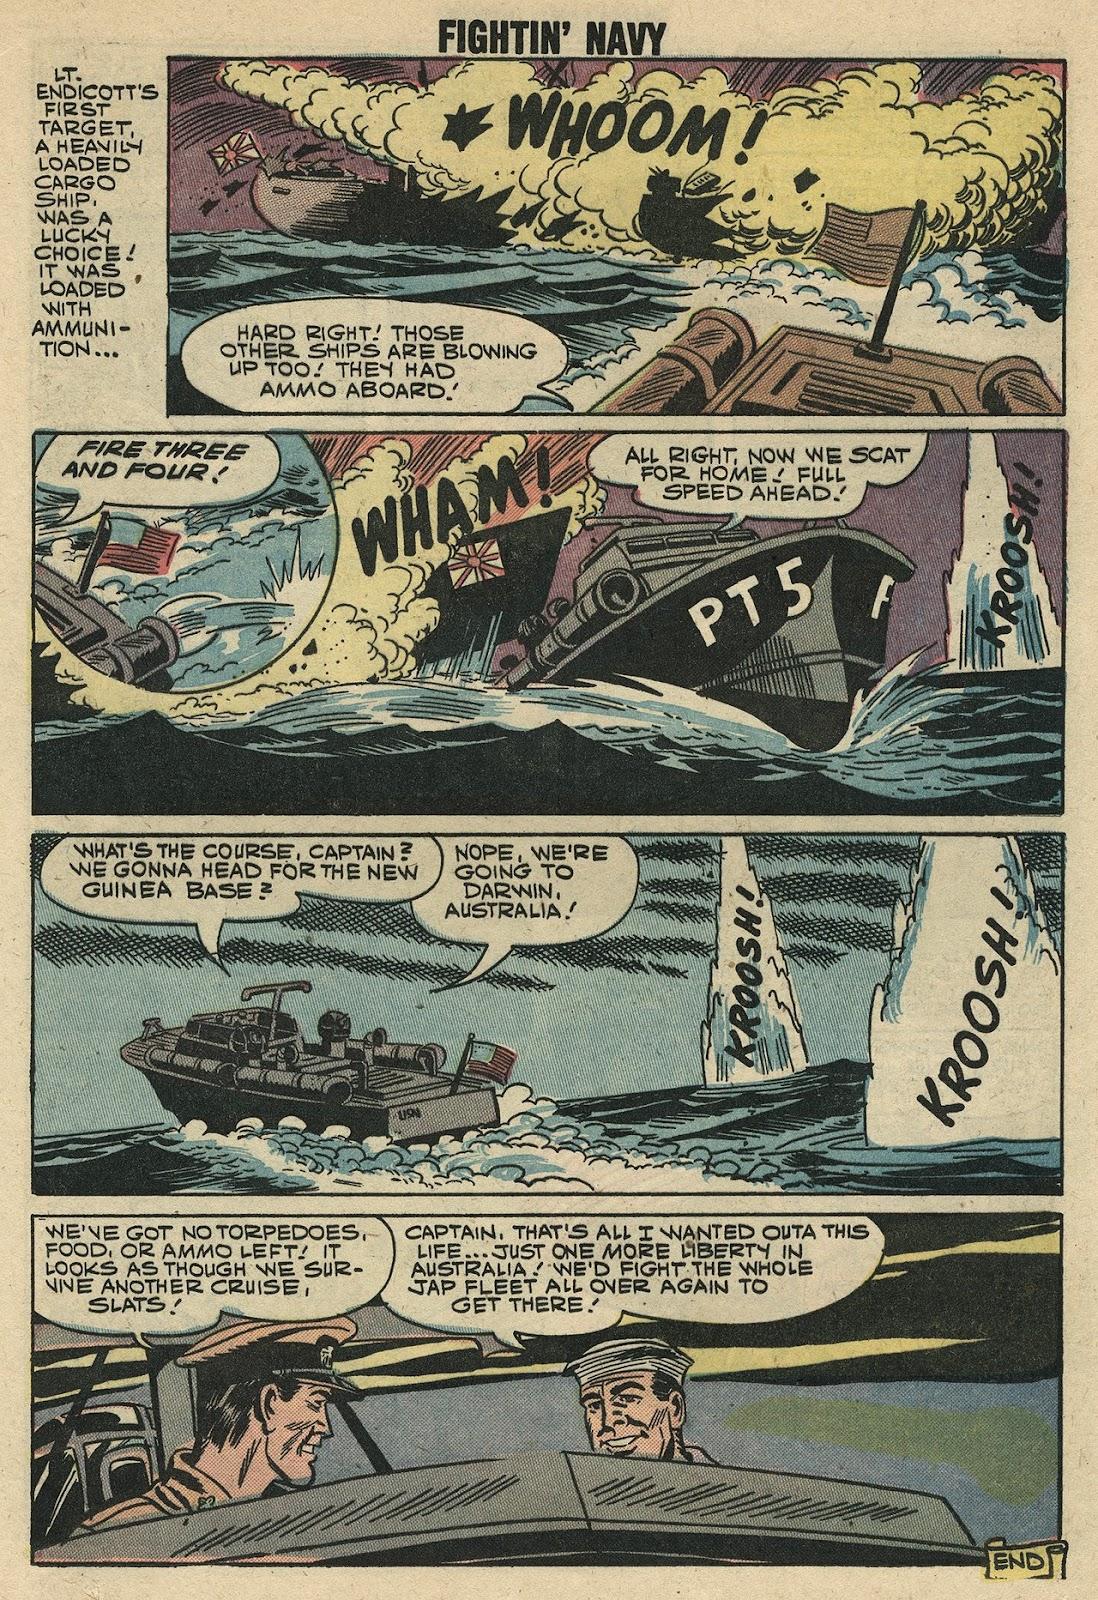 Read online Fightin' Navy comic -  Issue #86 - 19